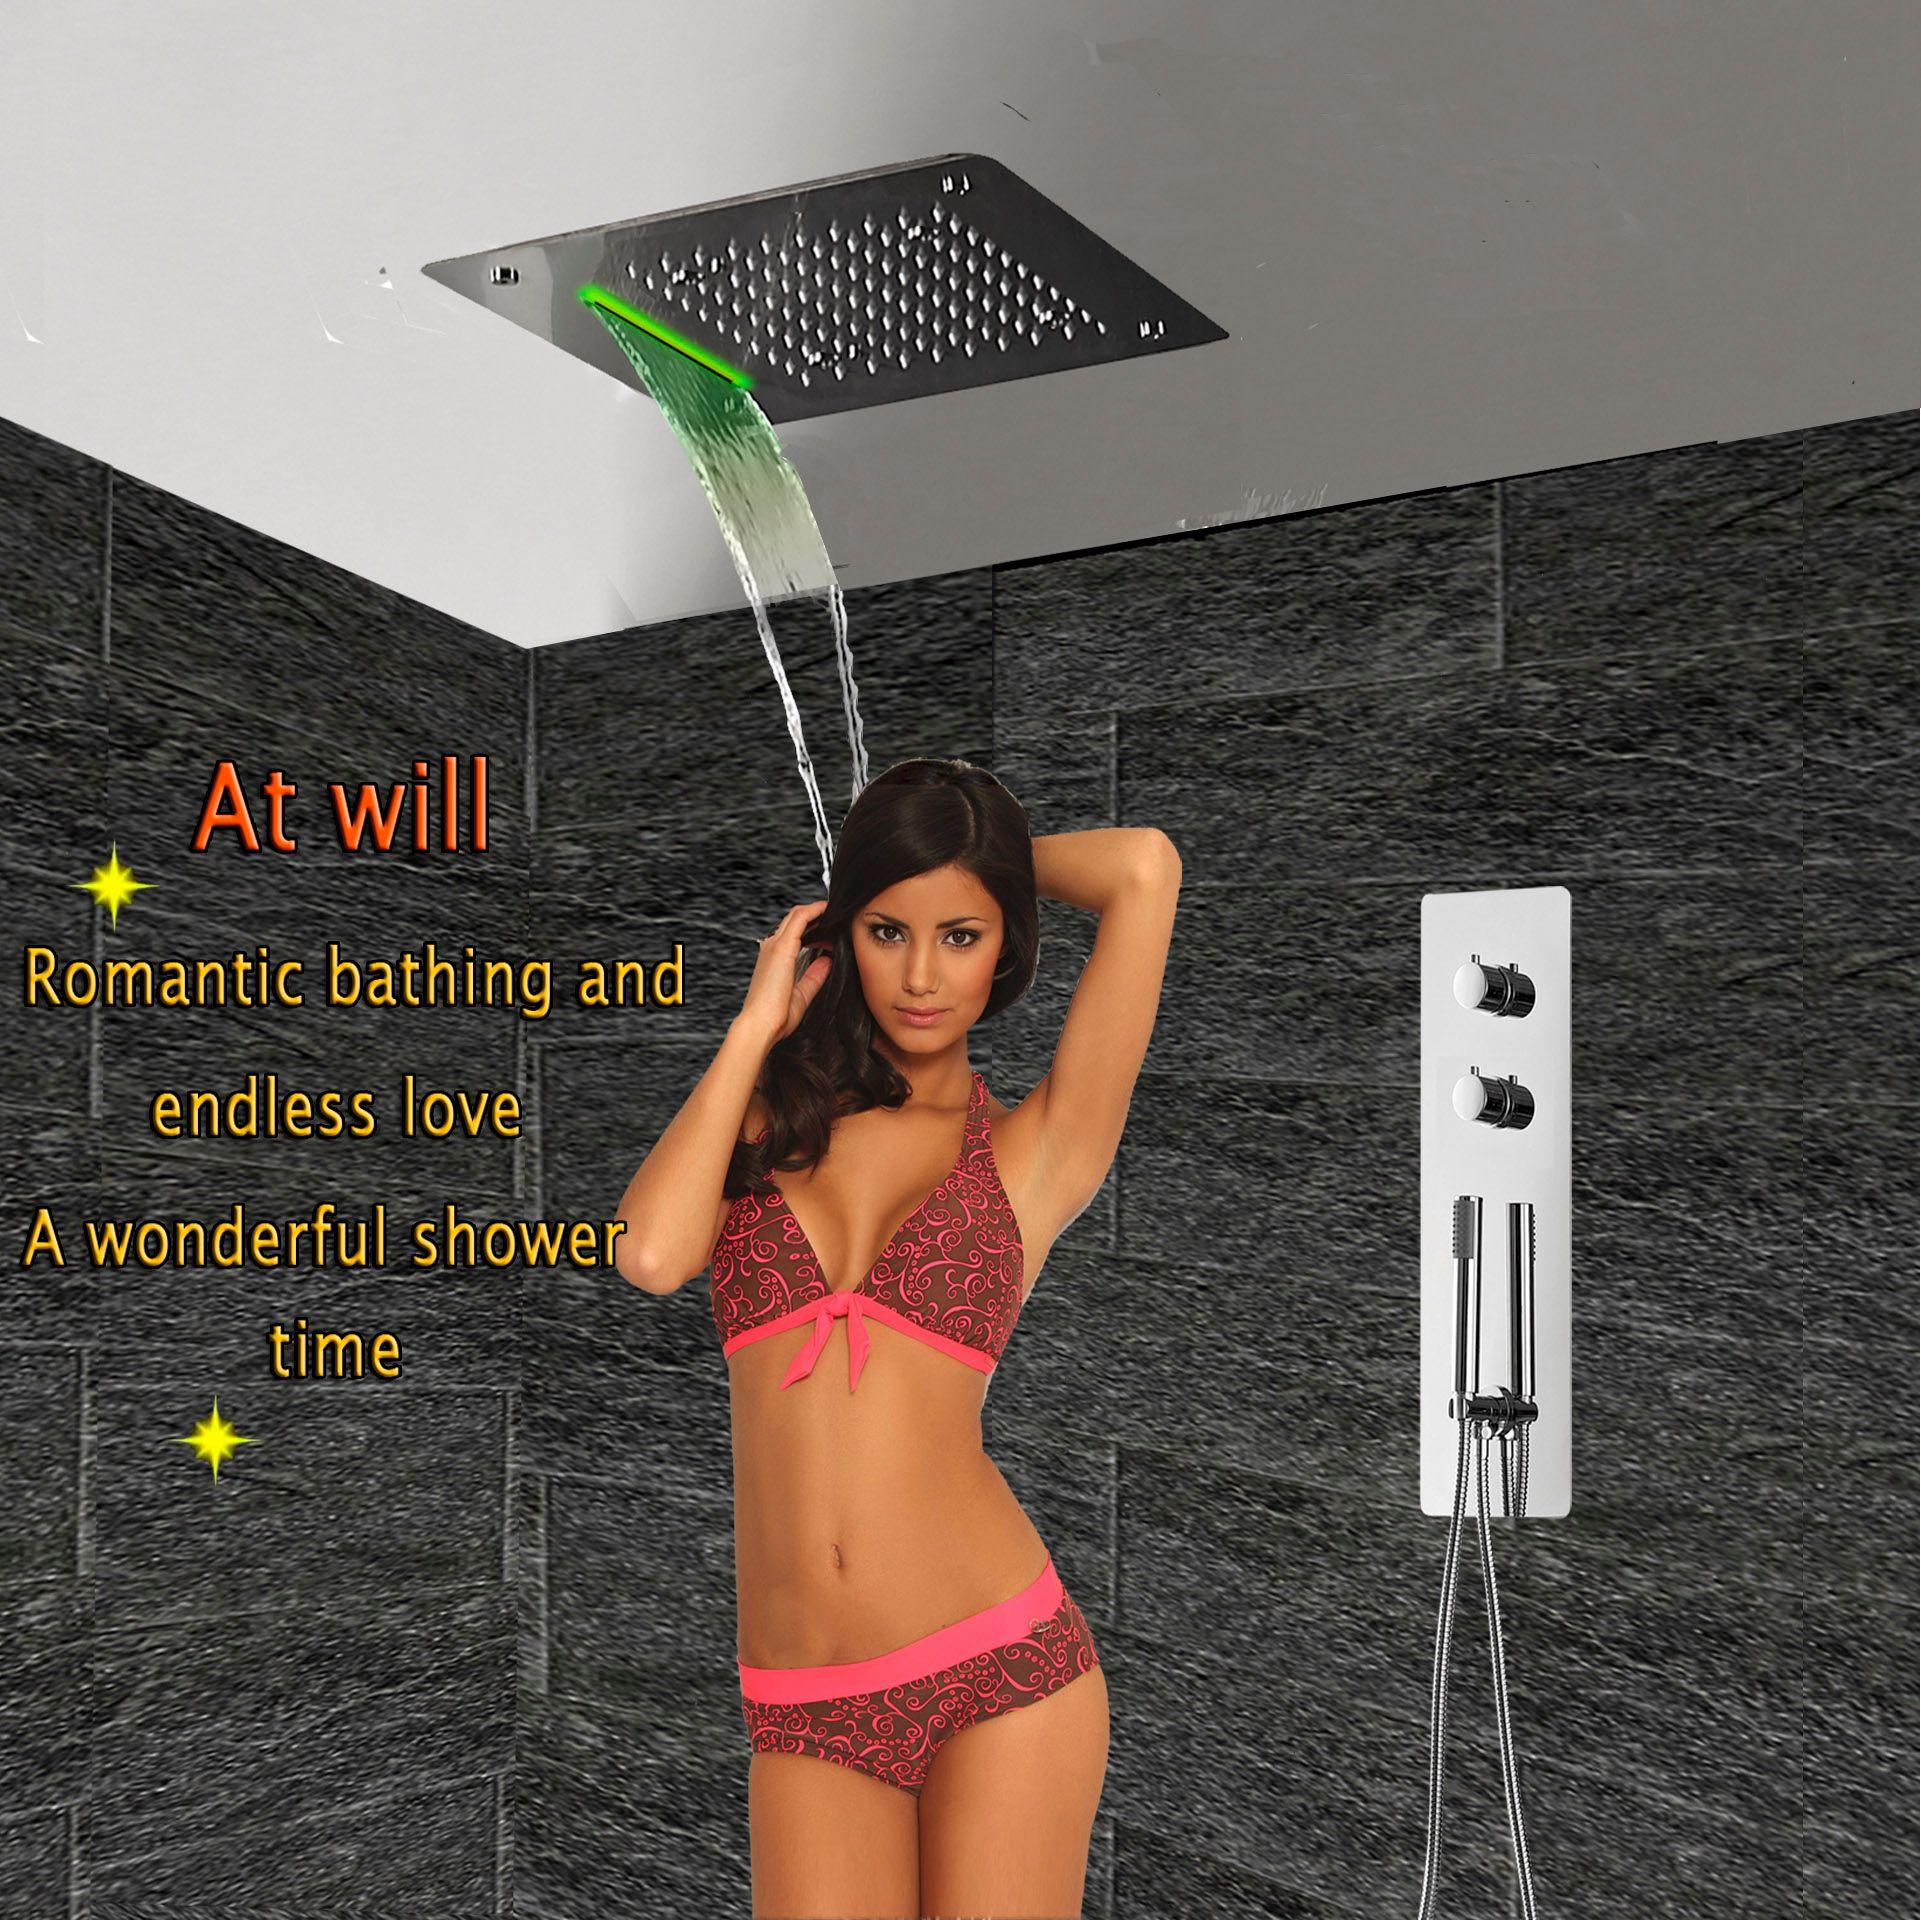 Verdeckte Thermostat Badezimmer Duschpaneel Armaturen Ventil der Wand befestigter Regen Regen Wasserfall Deckenduschkopf LED-Bad-Armaturen-System